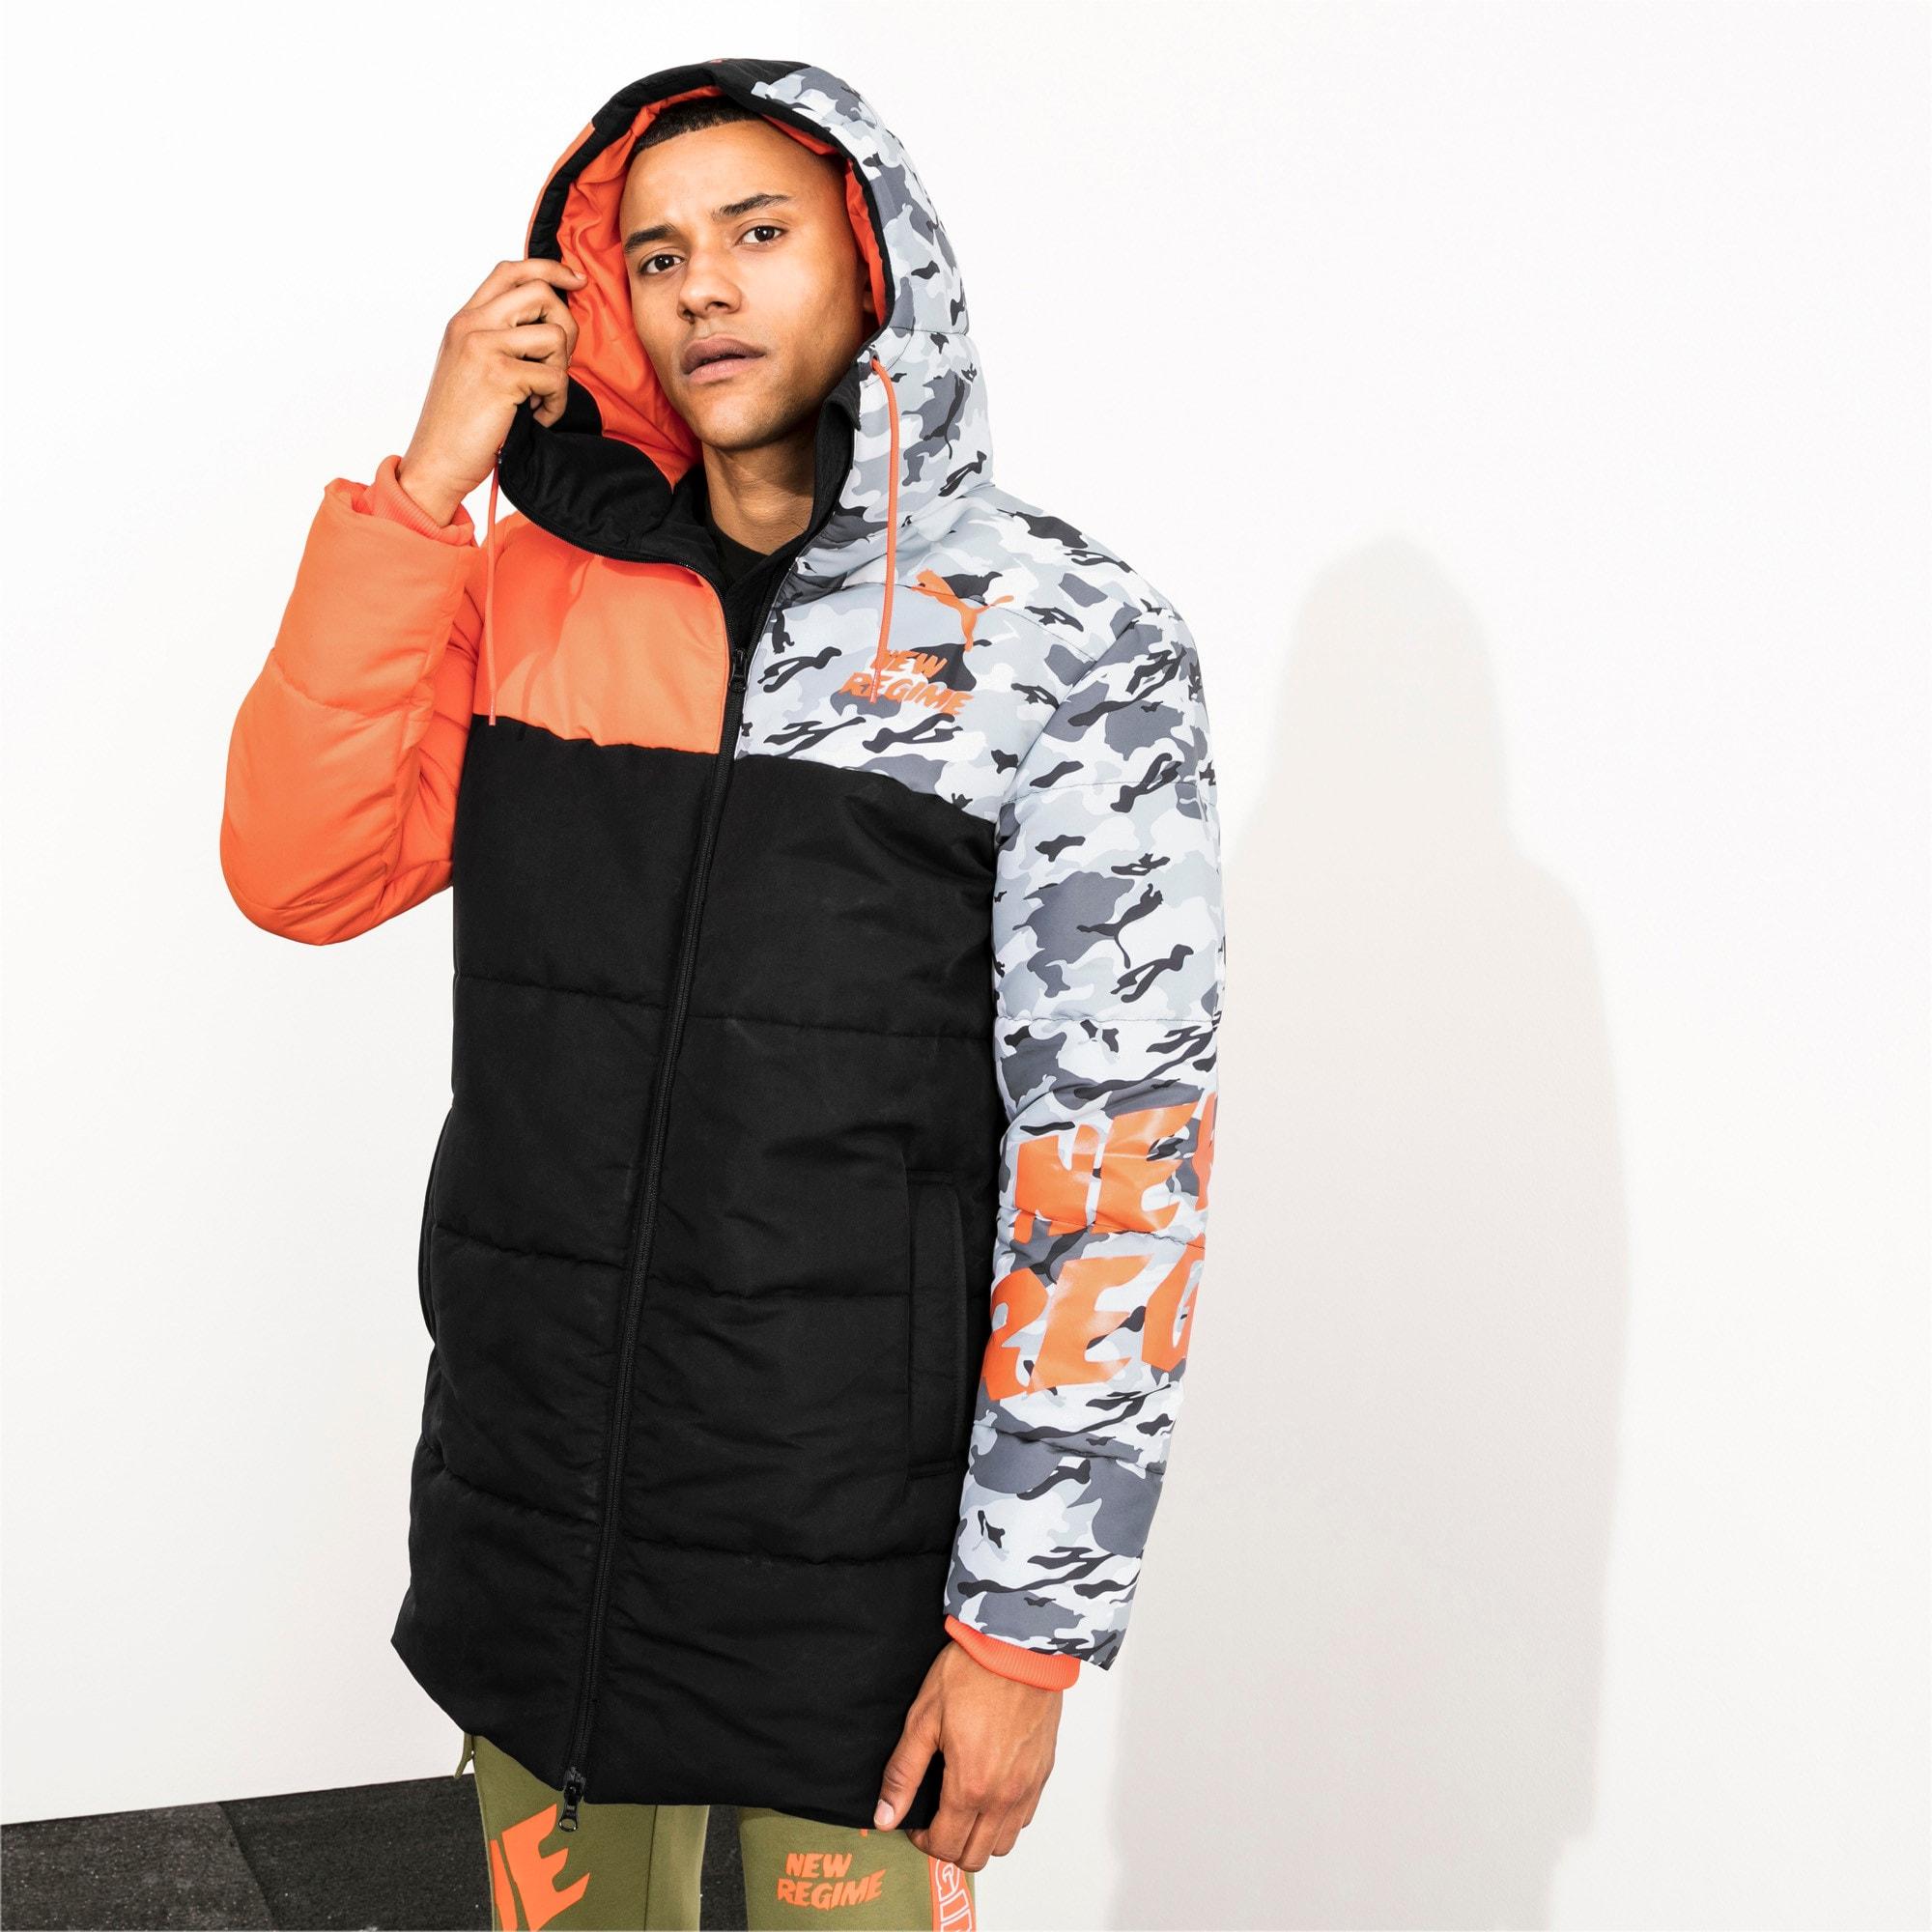 Thumbnail 7 of PUMA x ATELIER NEW REGIME Long Zip-Up Men's Hooded Jacket, Puma Black, medium